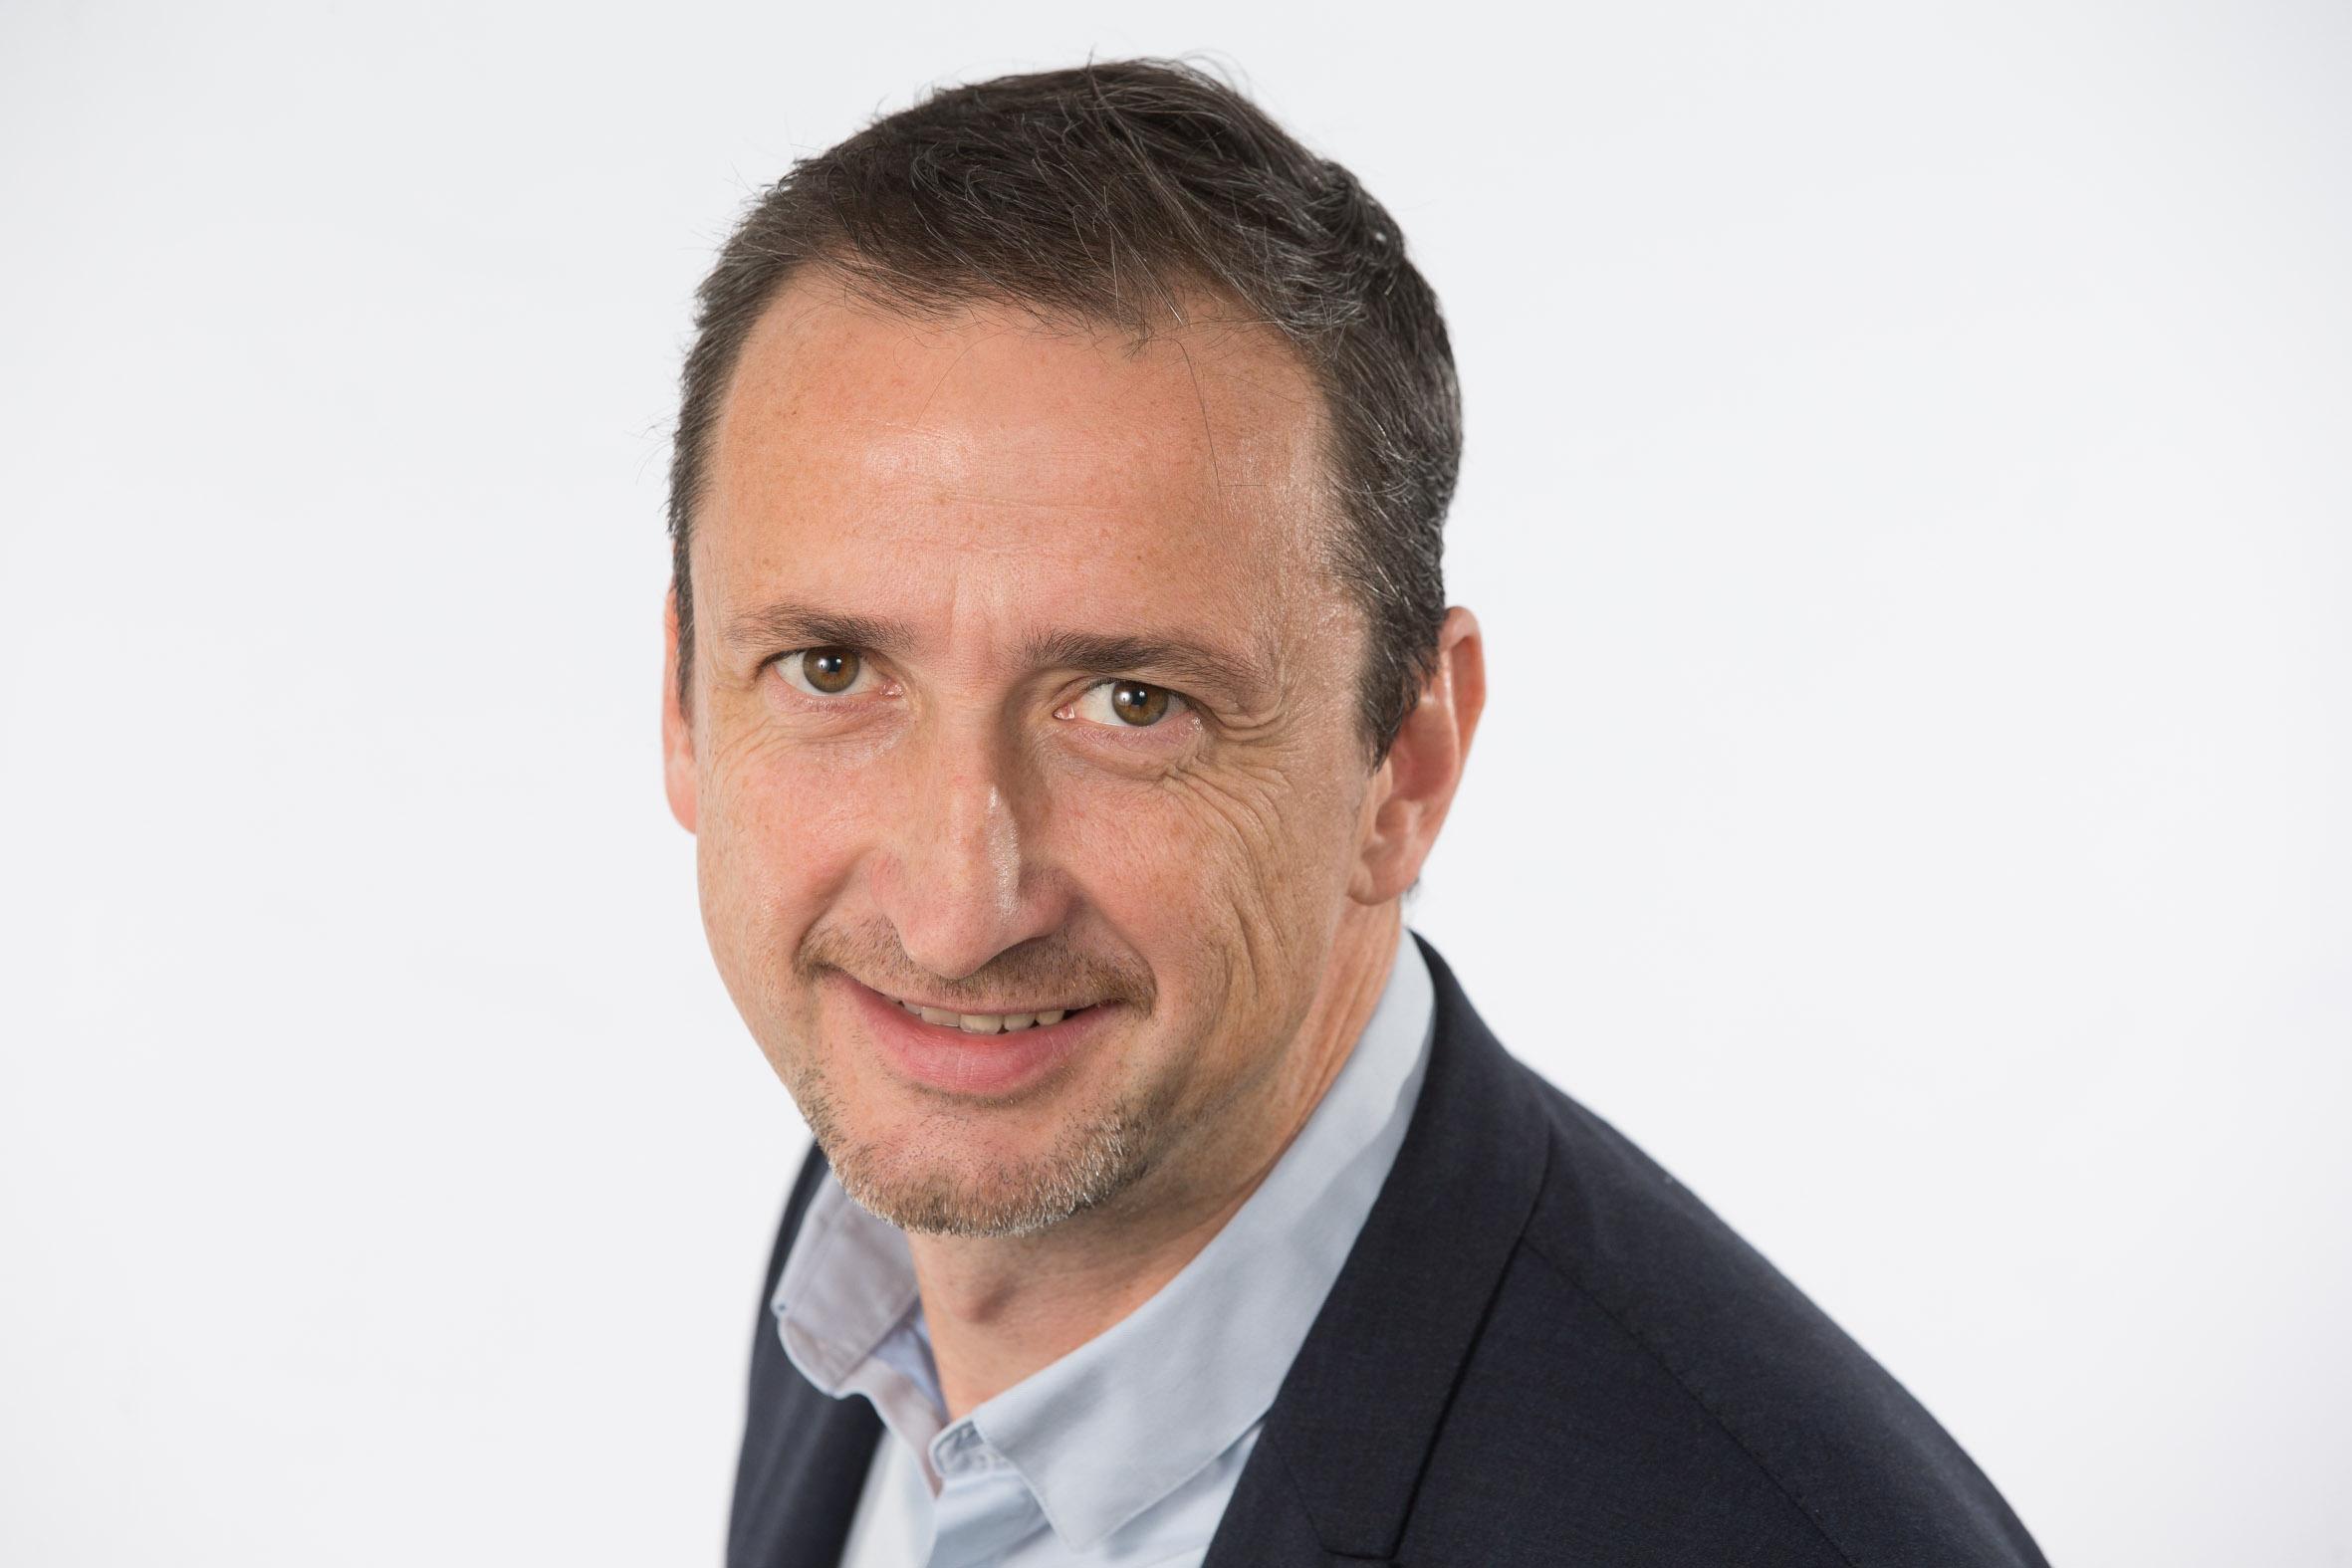 Carsten Videcrantz